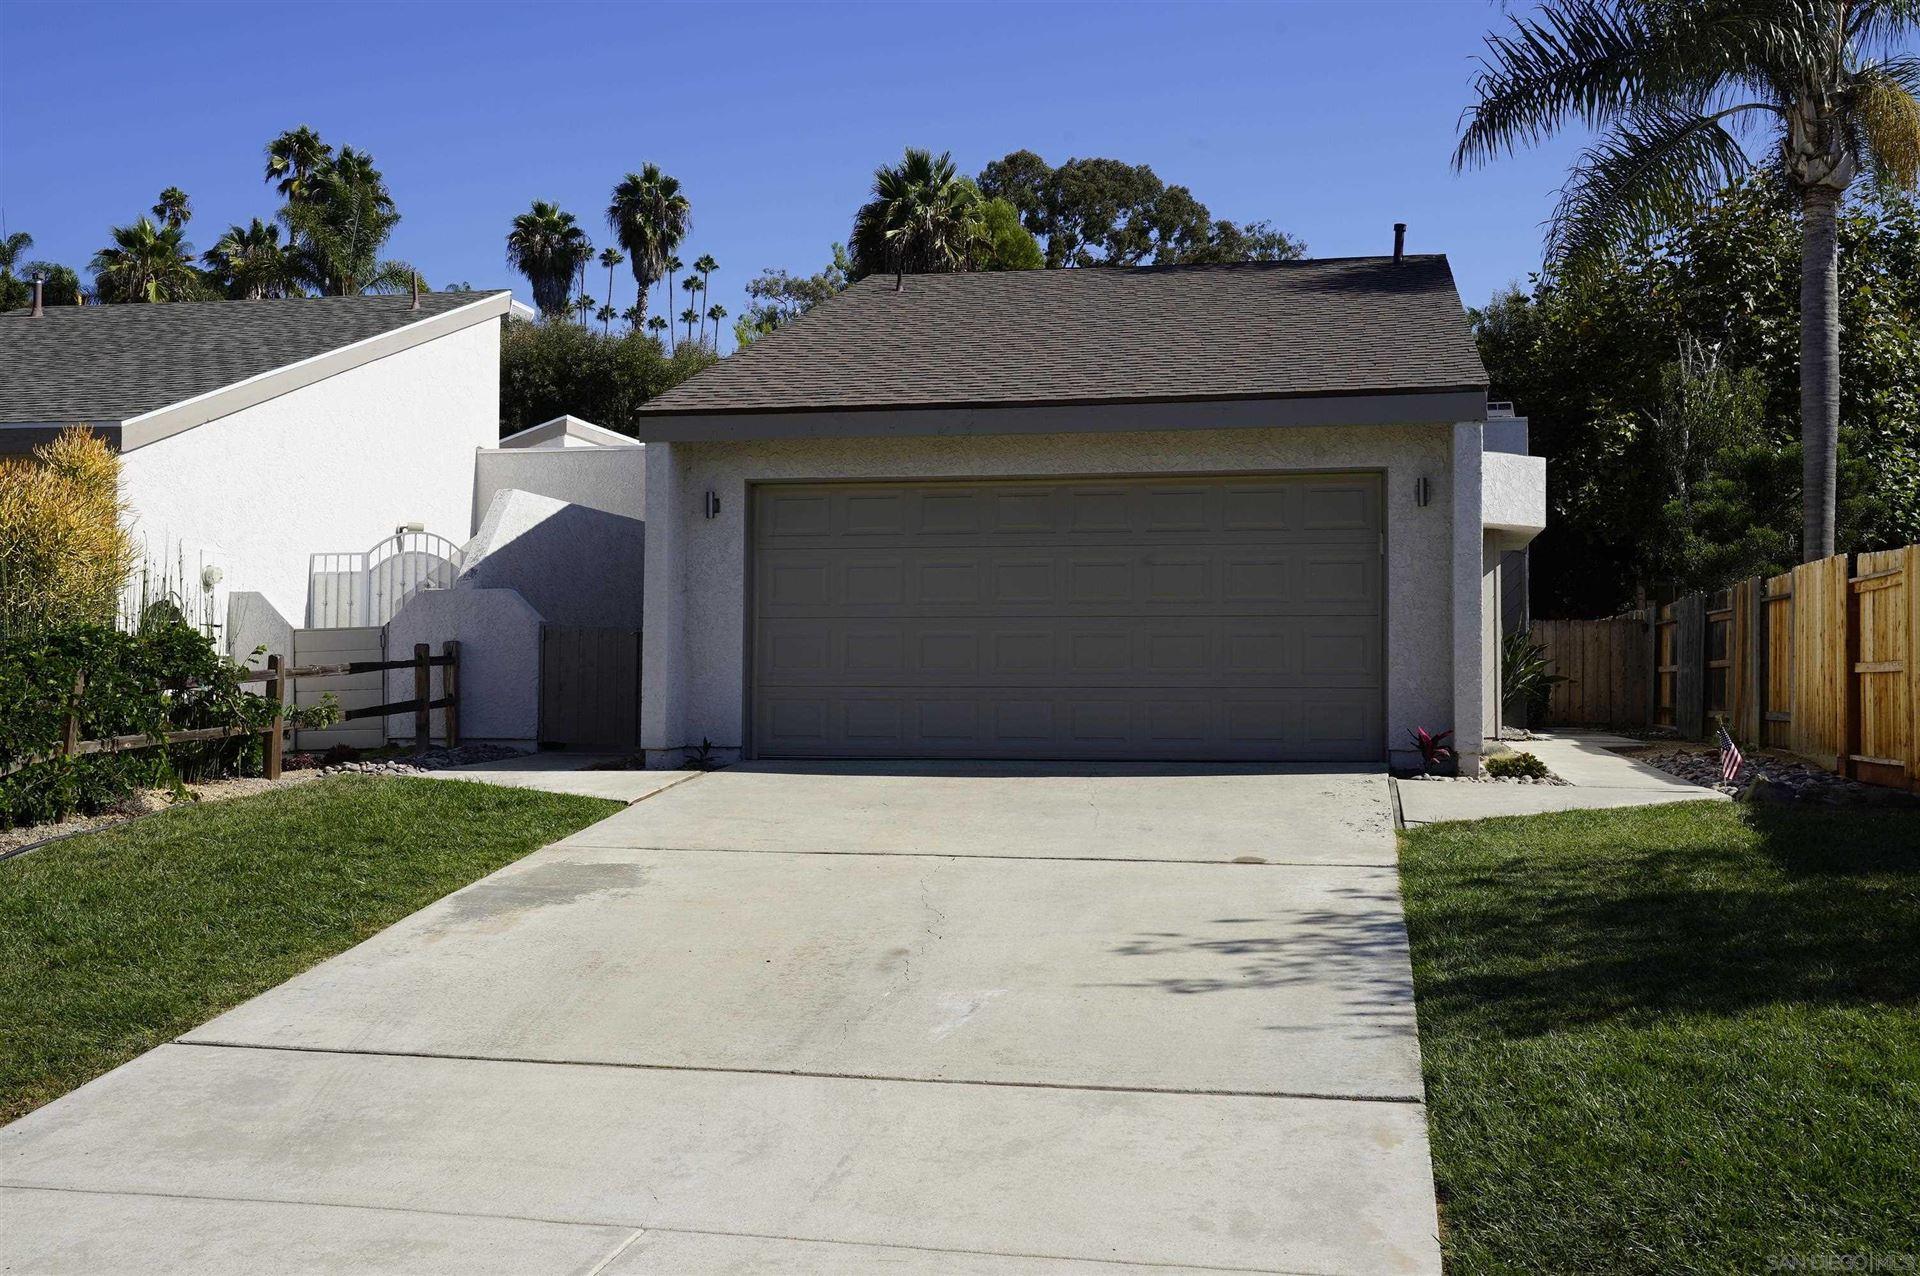 Photo of 2727 Abejorro St., Carlsbad, CA 92009 (MLS # 210026536)